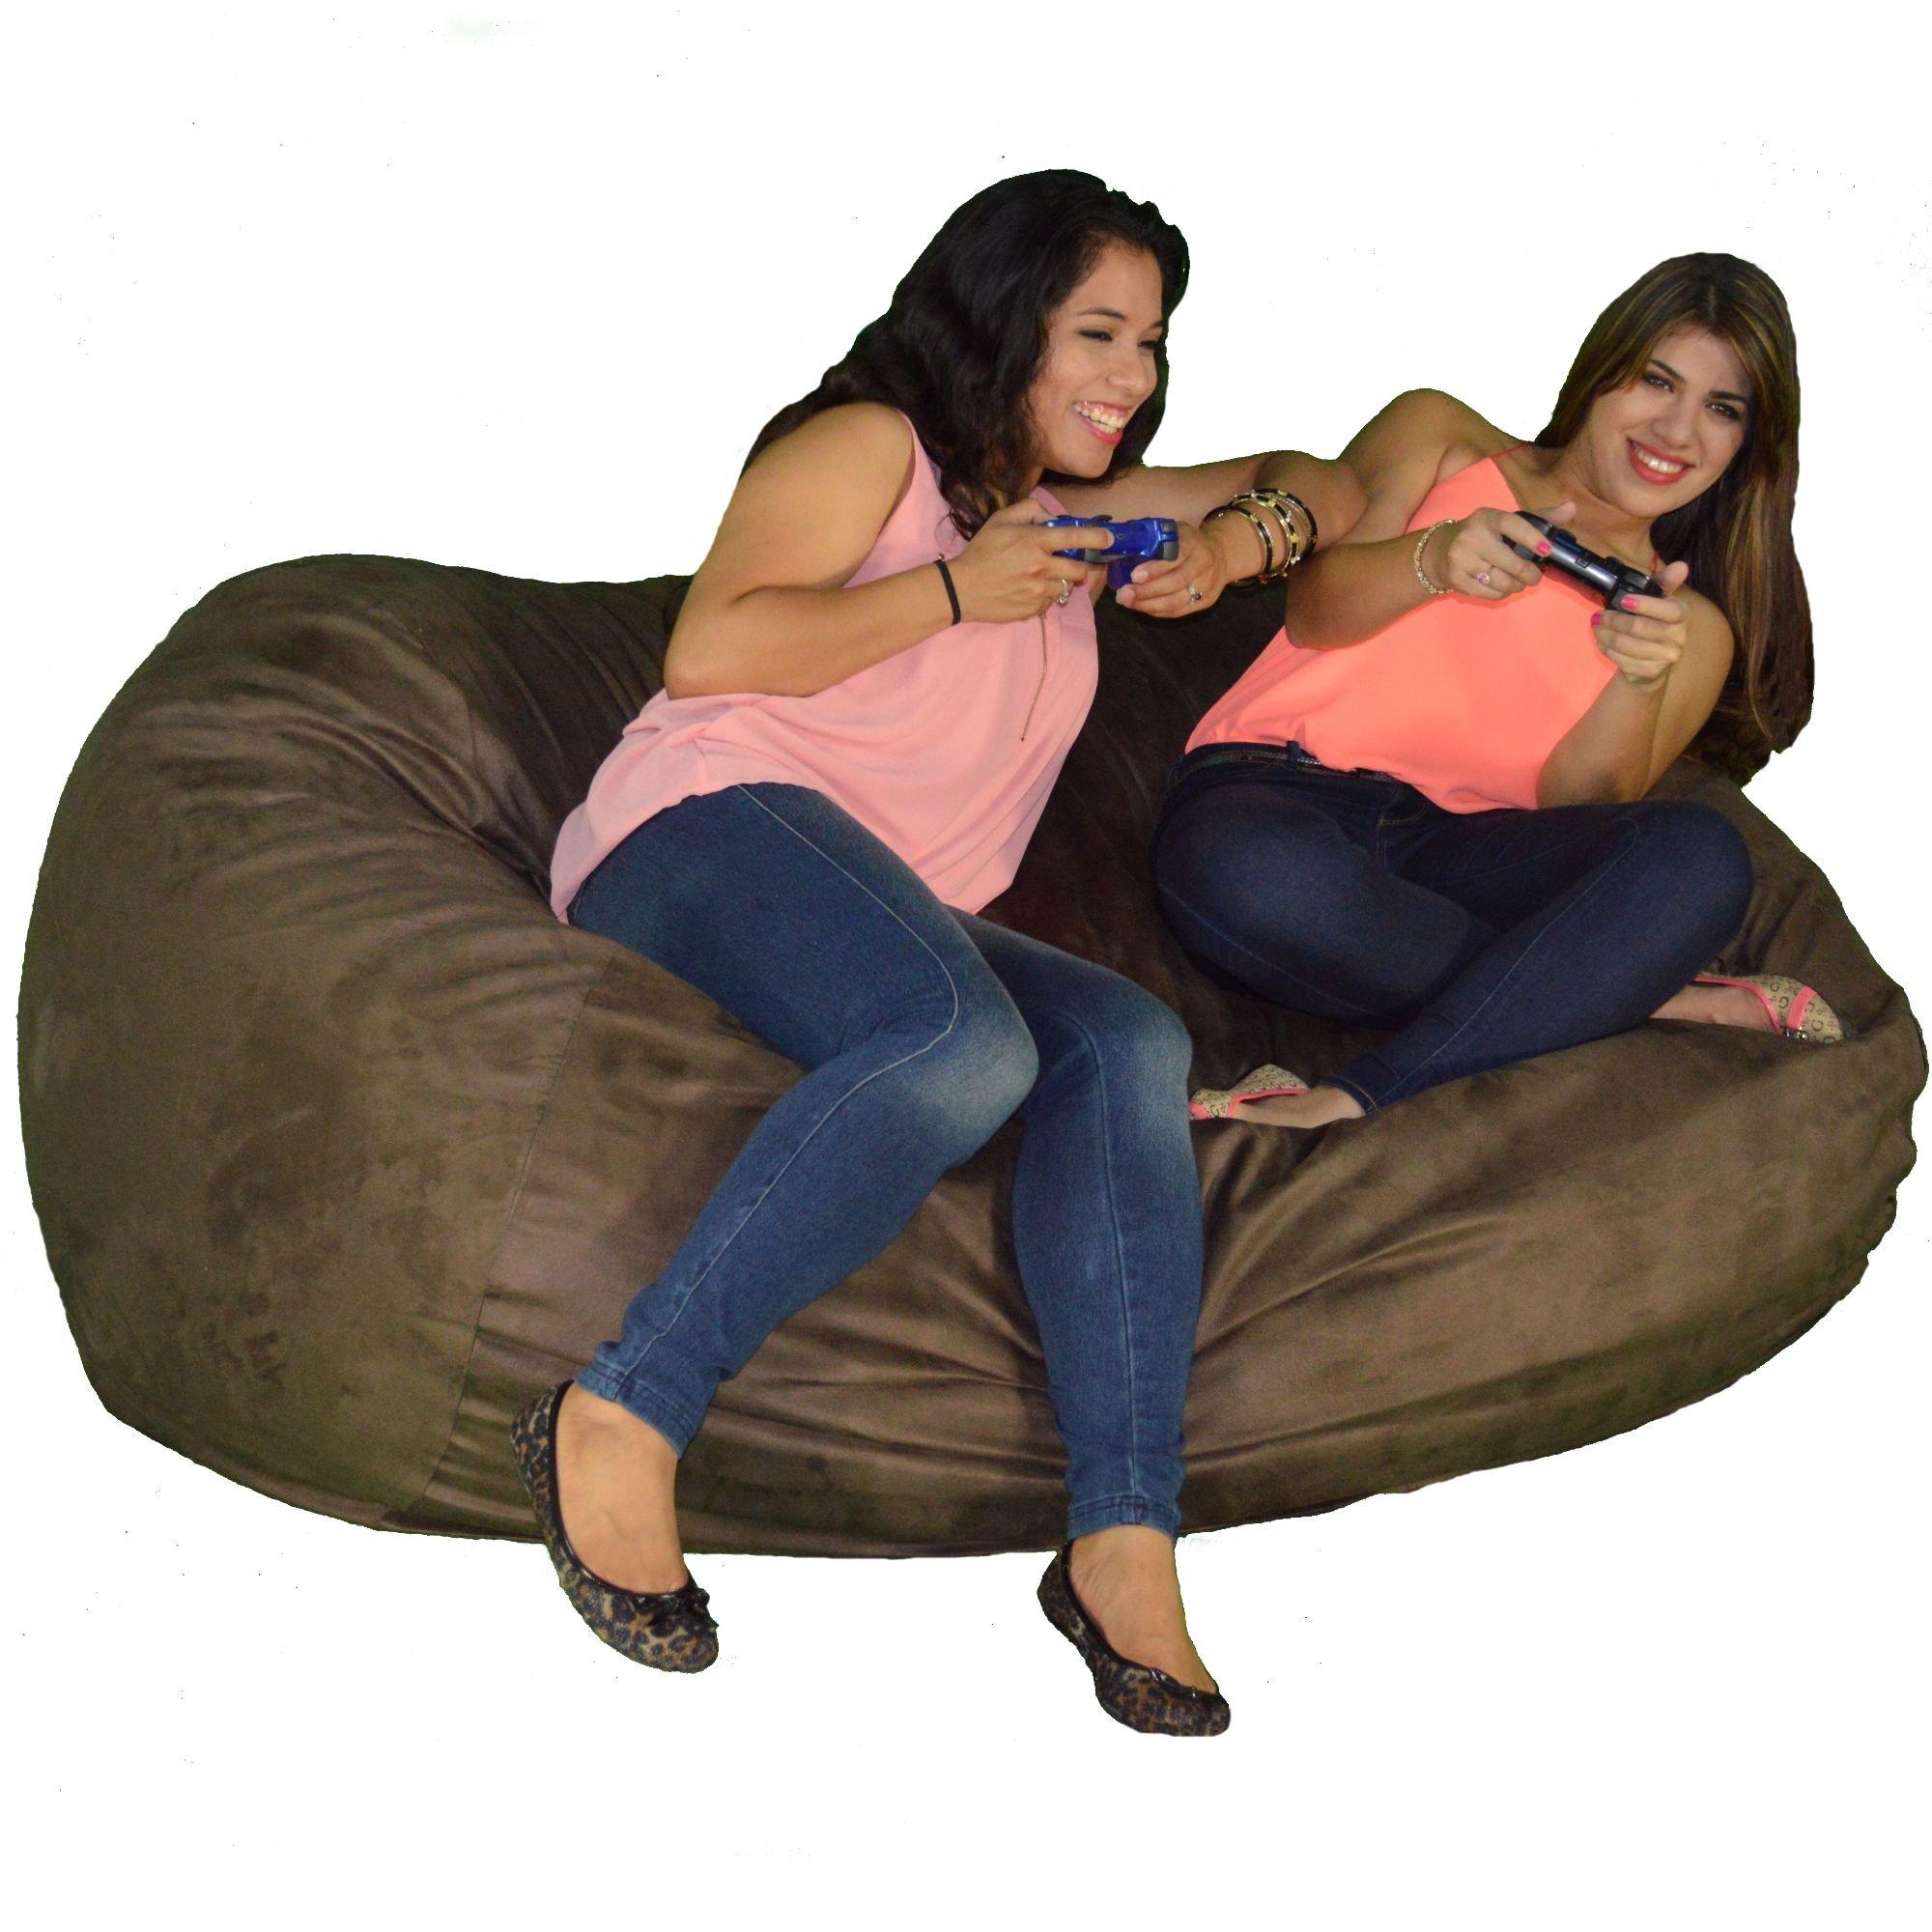 Cozy Sack 640-Cbb-Chocolate Maui Beanbag Chair, 6' , Chocolate by Cozy Sack